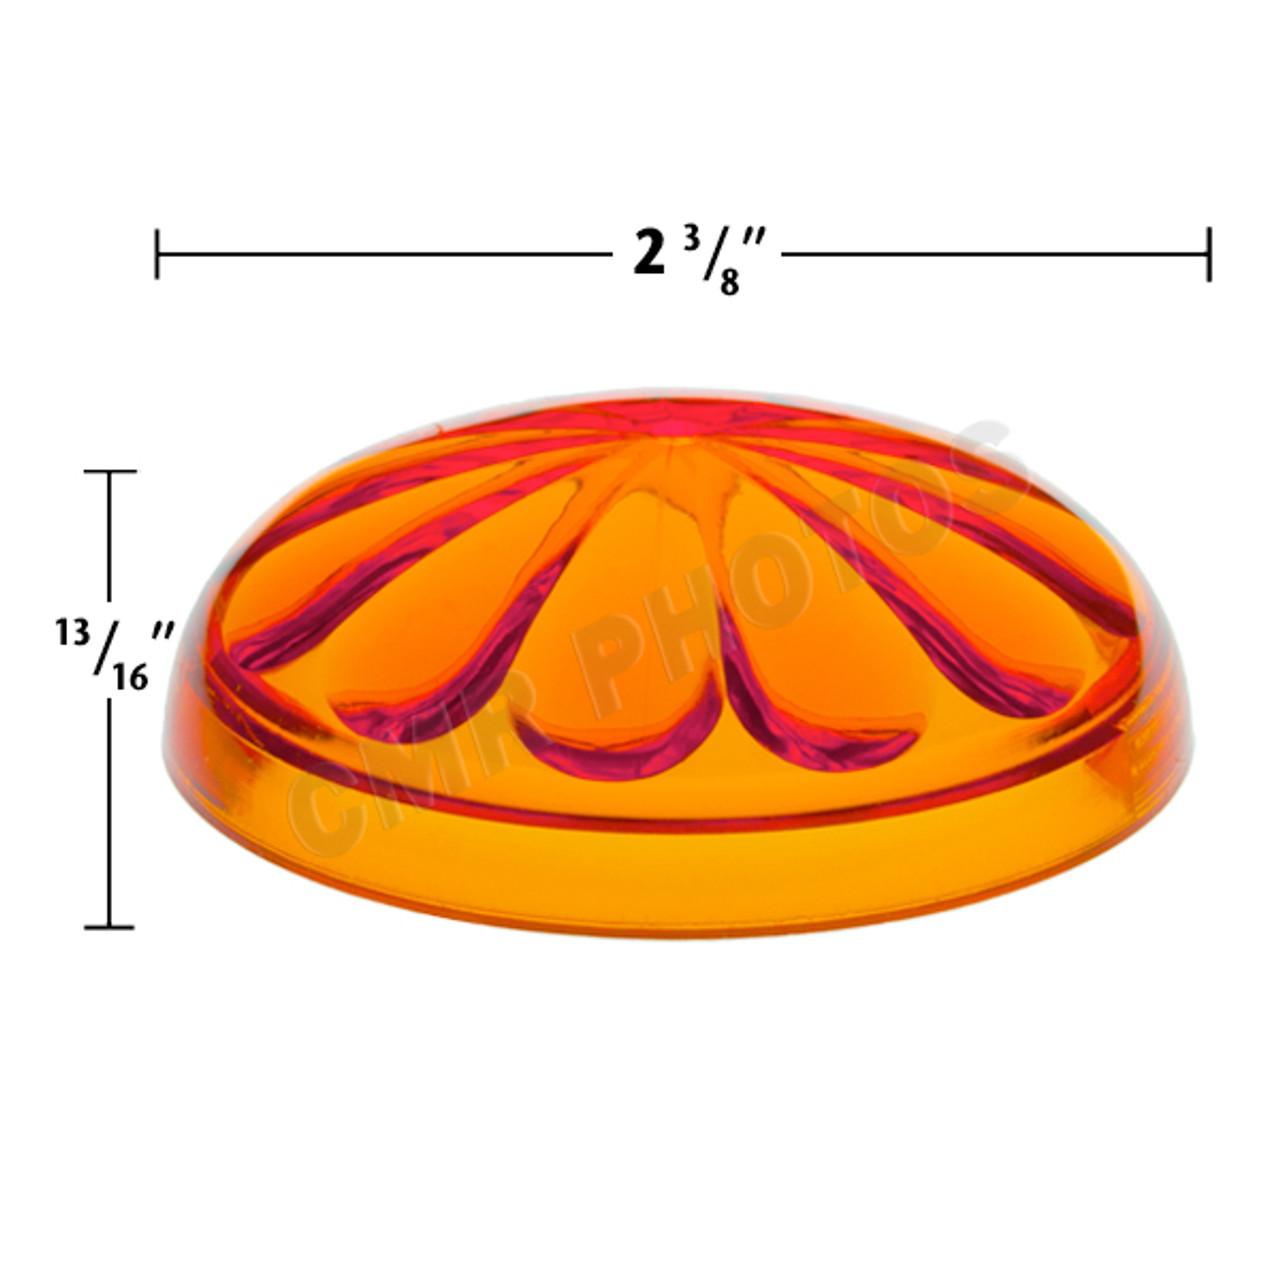 midway universal fun light turbo cap orange  [ 1280 x 1280 Pixel ]